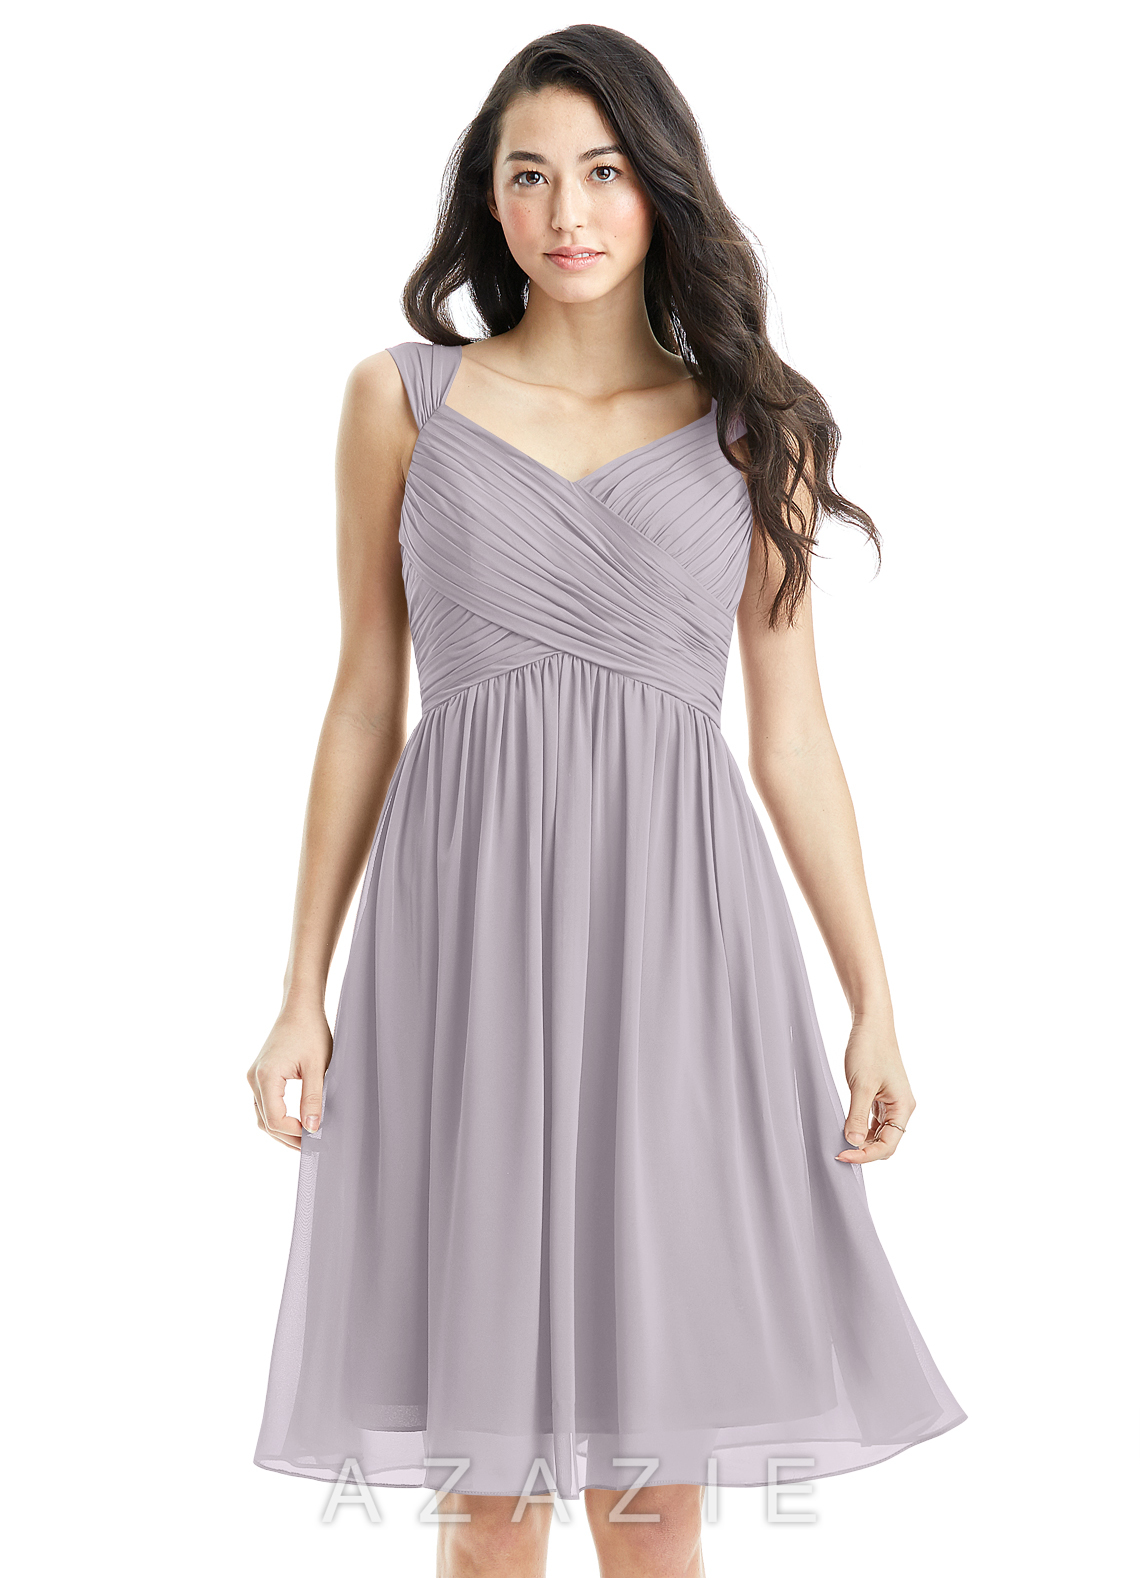 Azazie angie bridesmaid dress azazie loading zoom ombrellifo Image collections